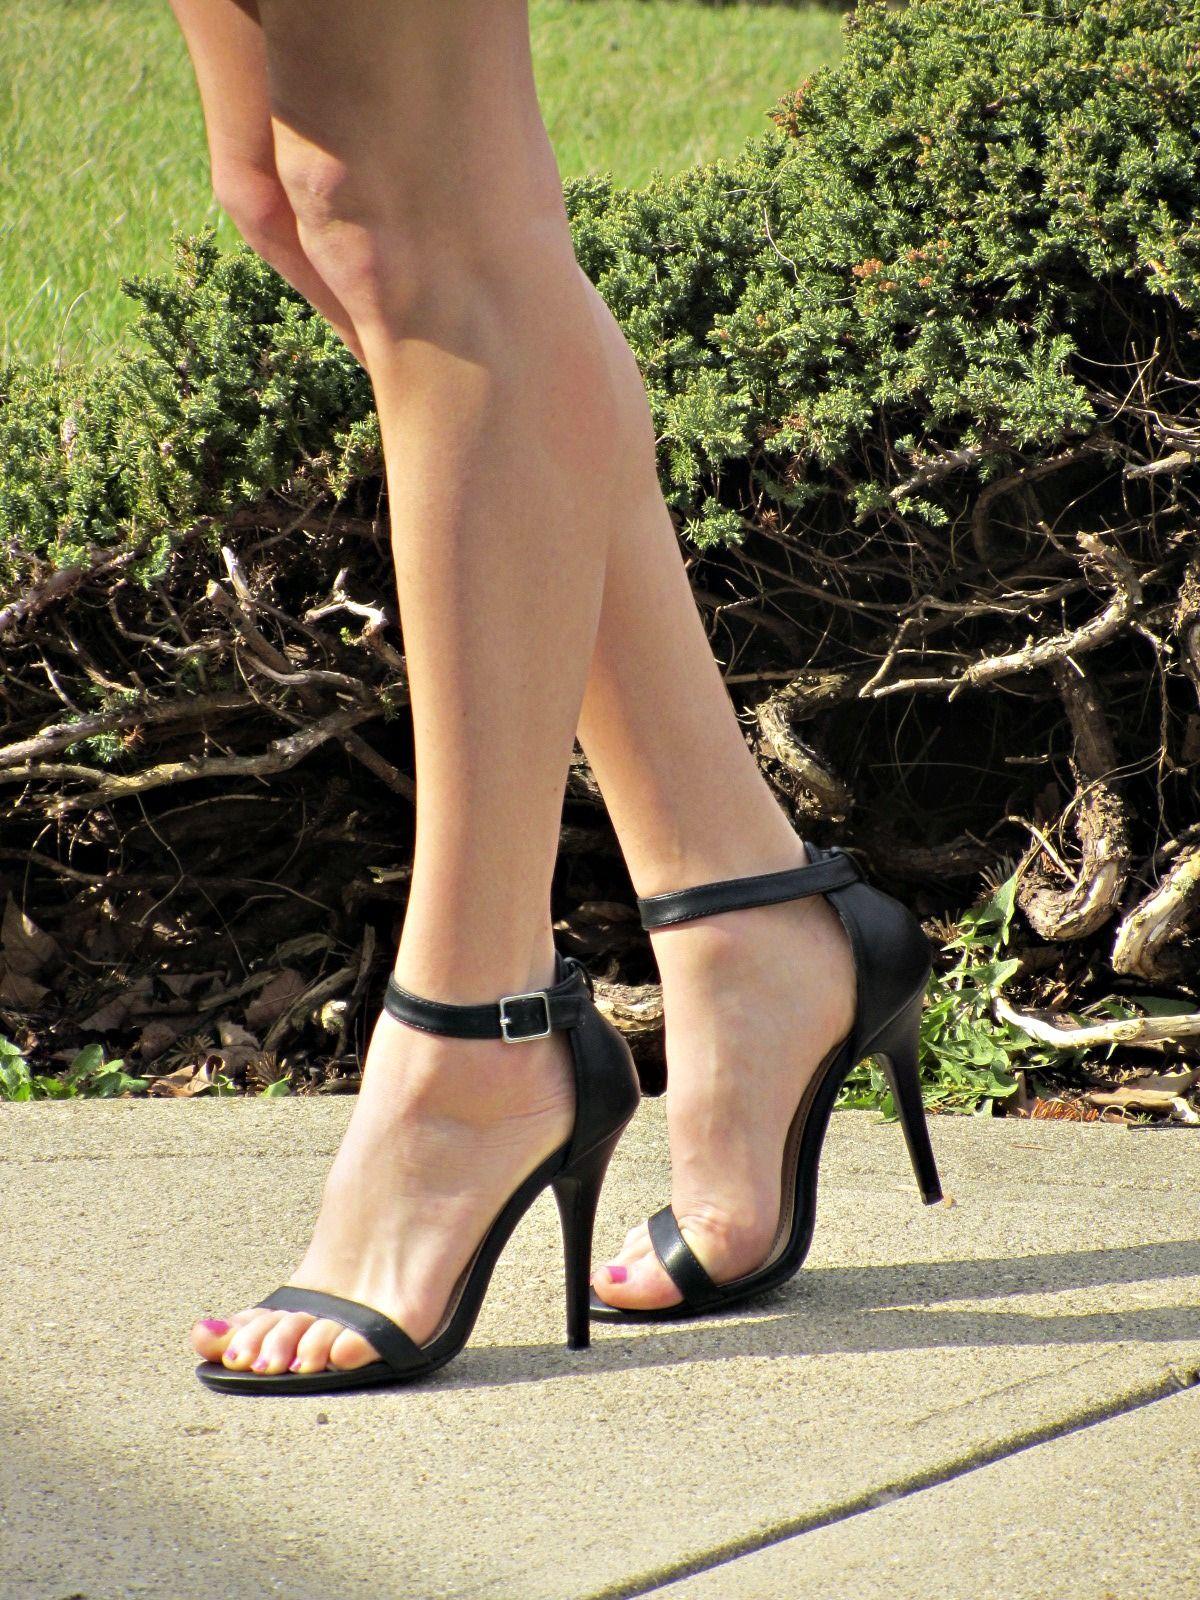 Comfortable 3 Inch Heels Photo Comfortable High Heels Most